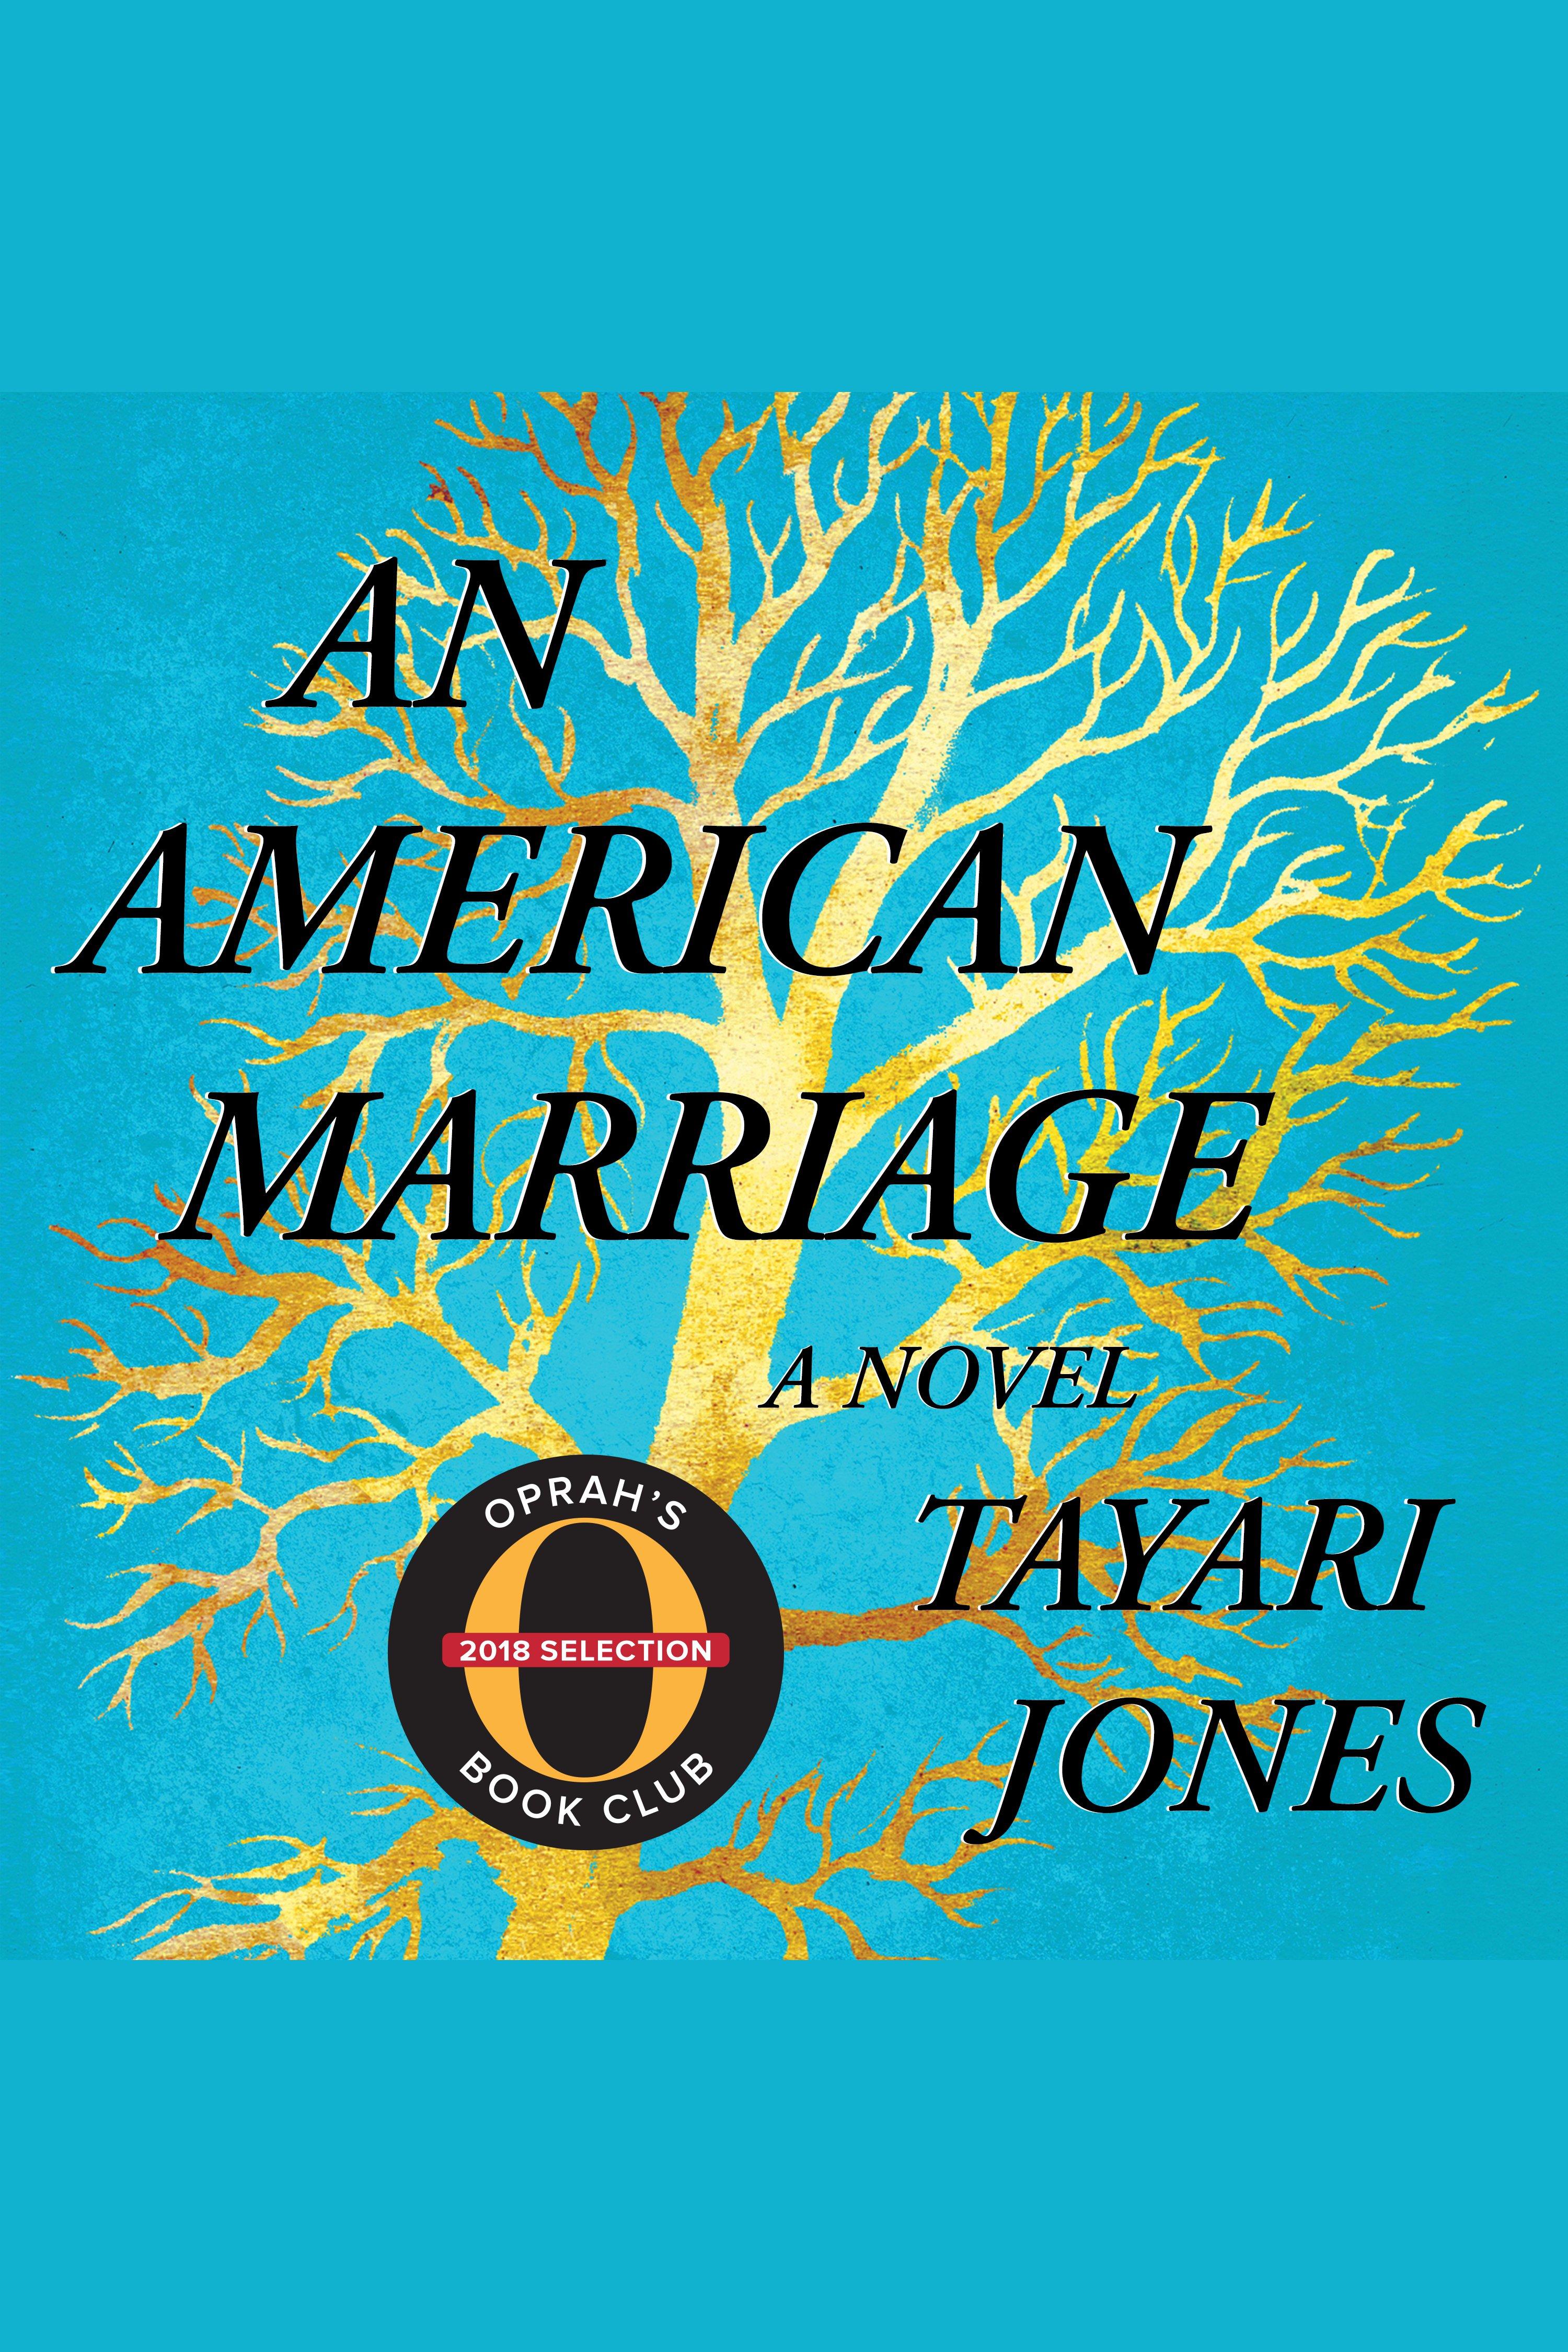 An American marriage [AudioEbook] : a novel